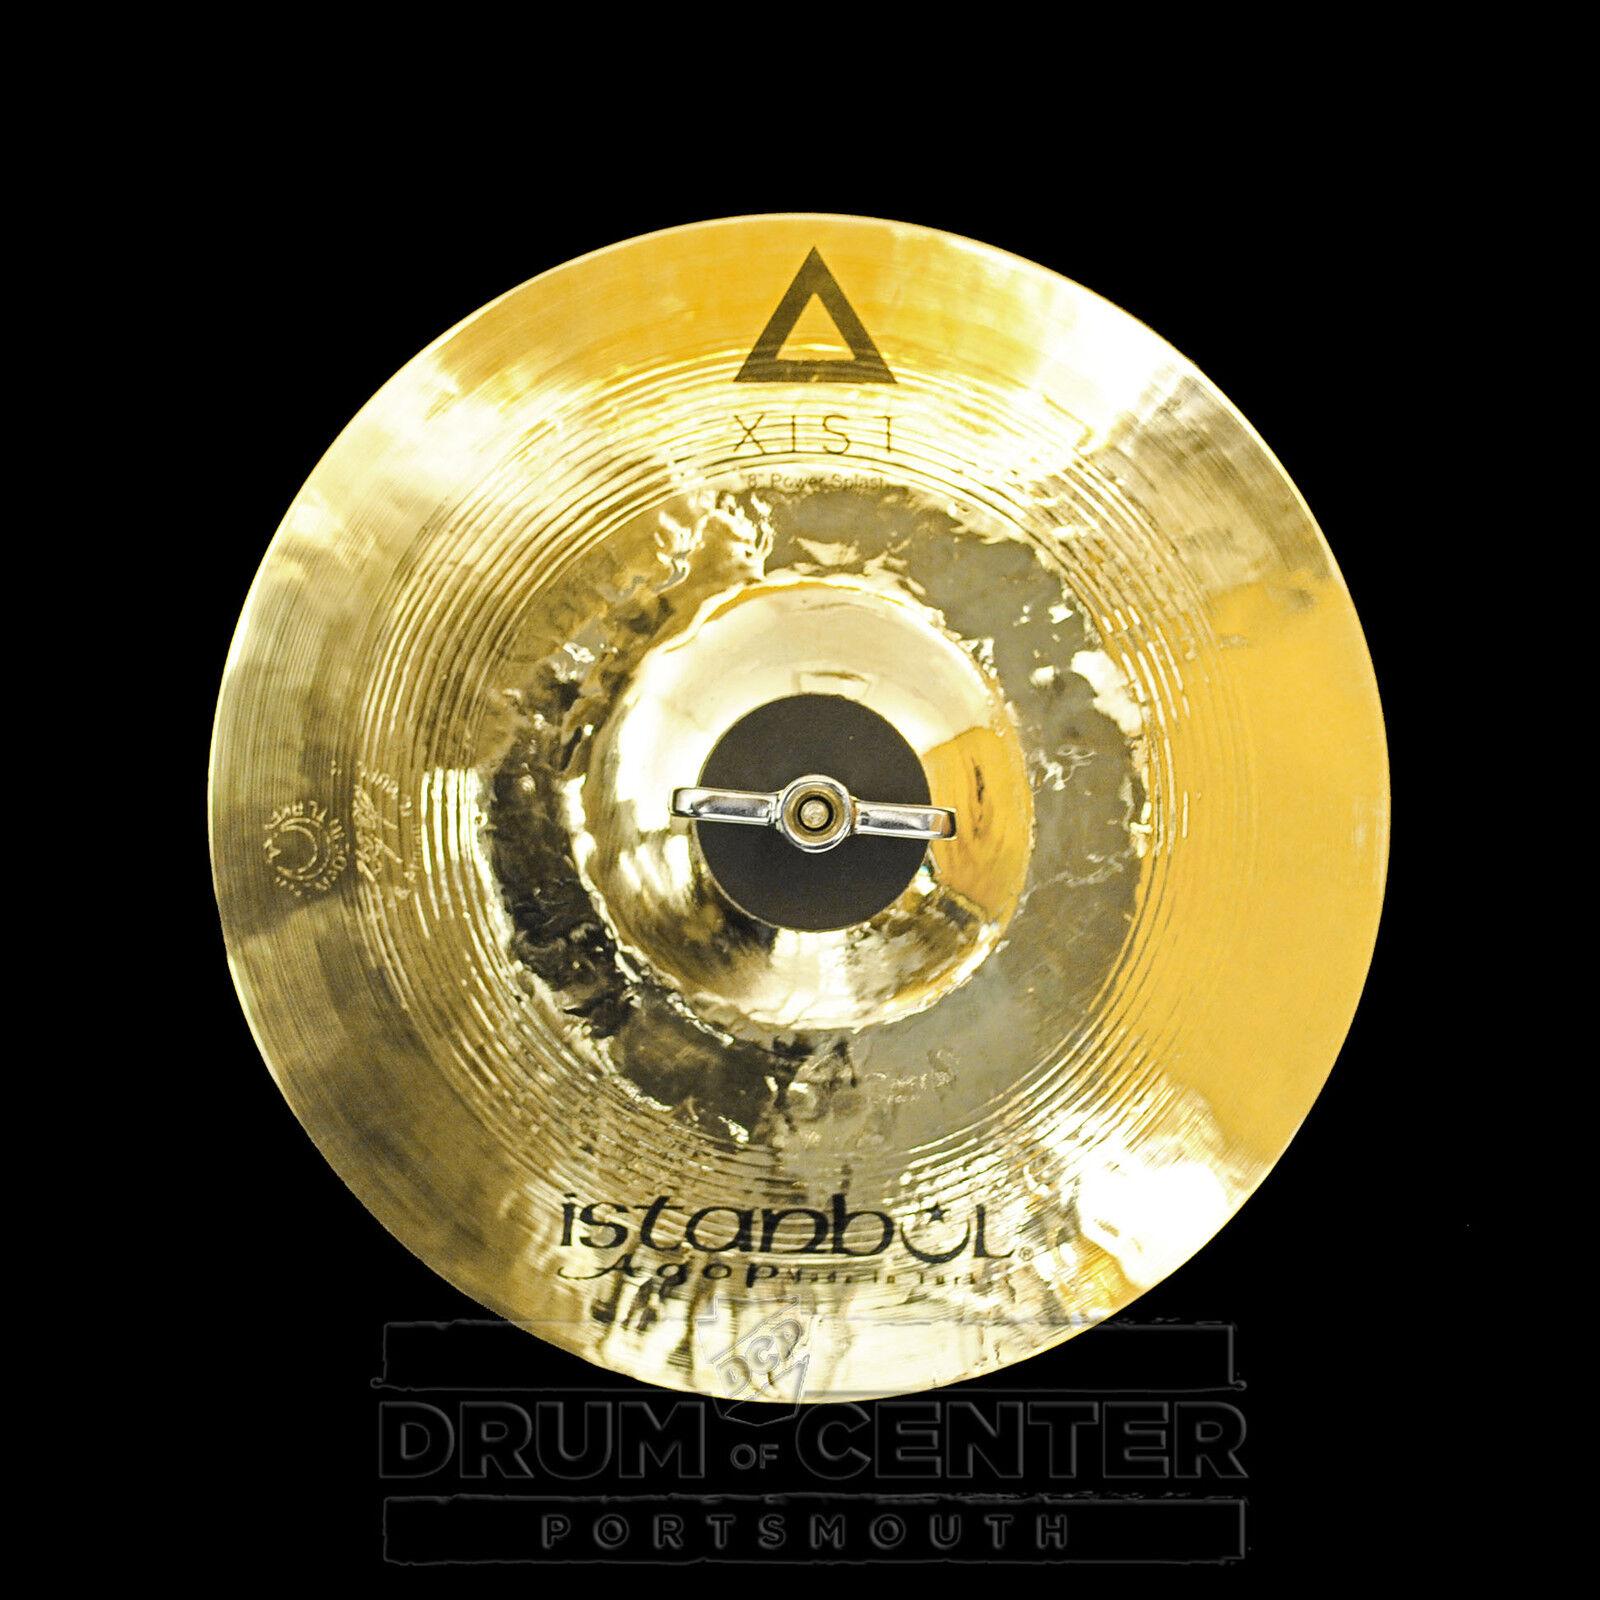 Istanbul Agop Xist Power Splash Cymbal 8  - Video Demo